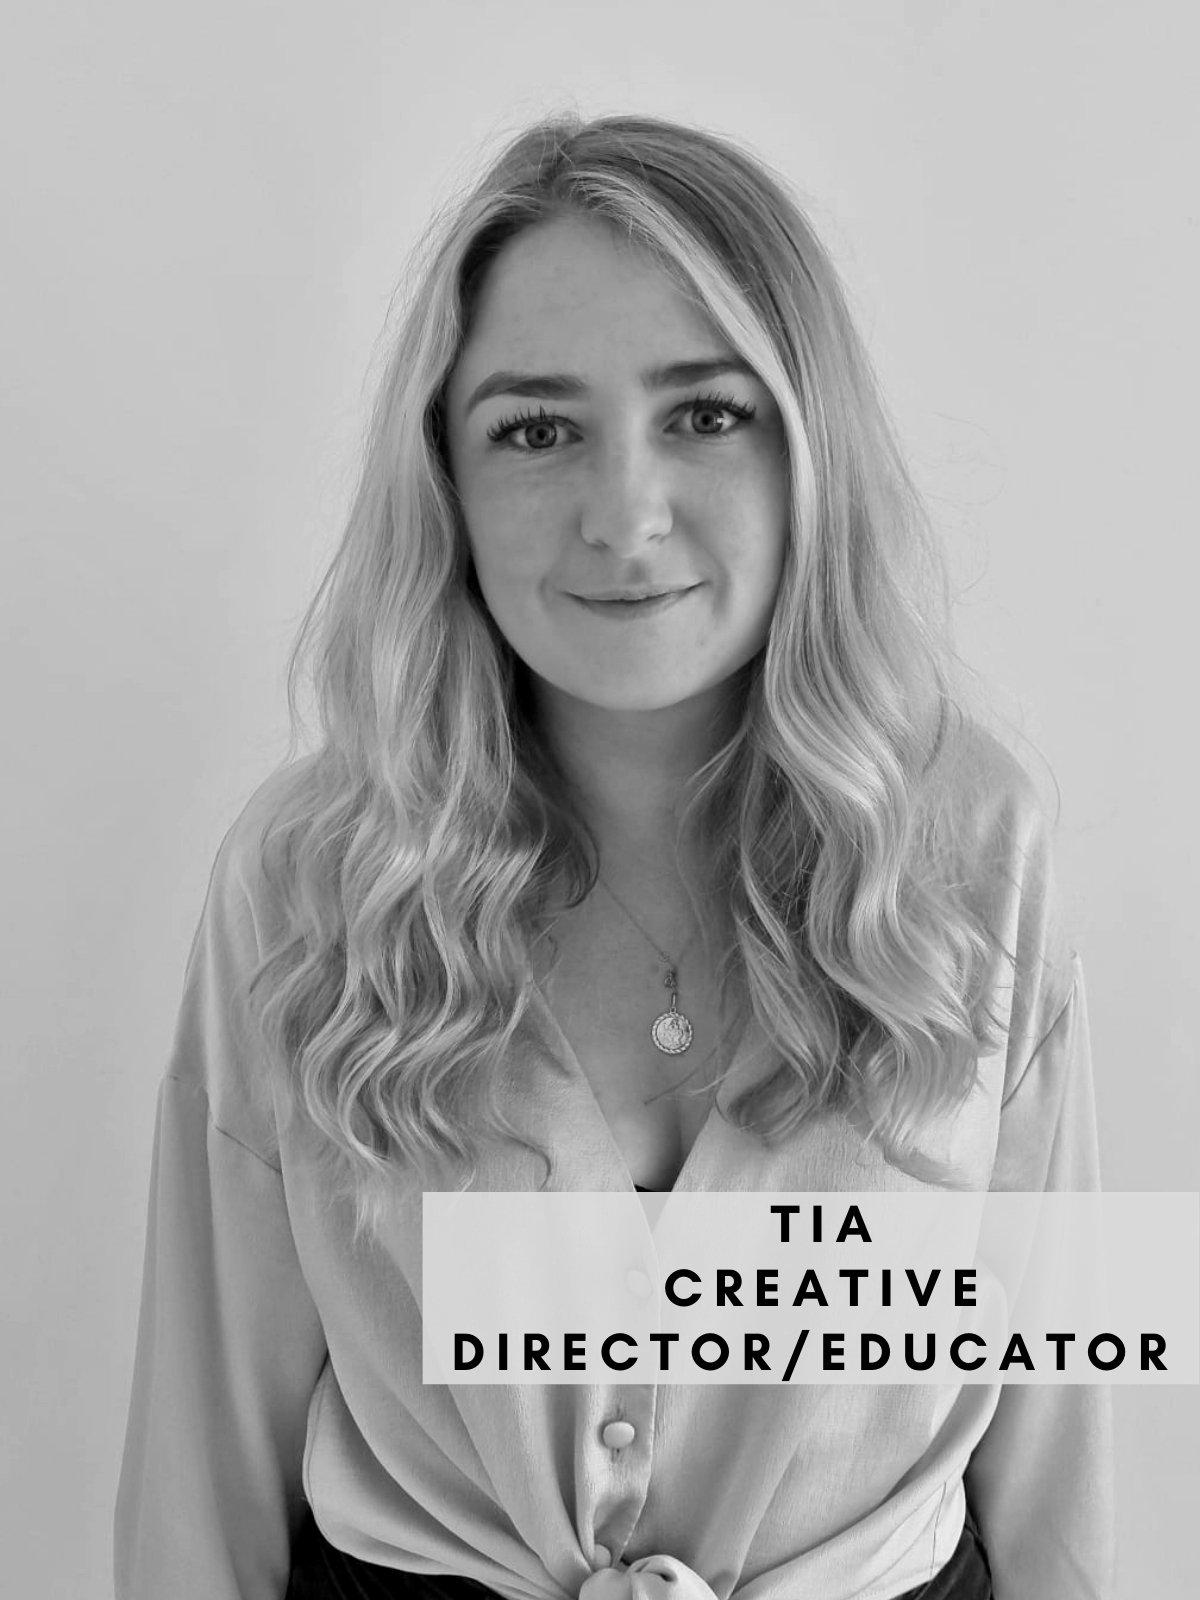 Tia – Creative Director/Educator